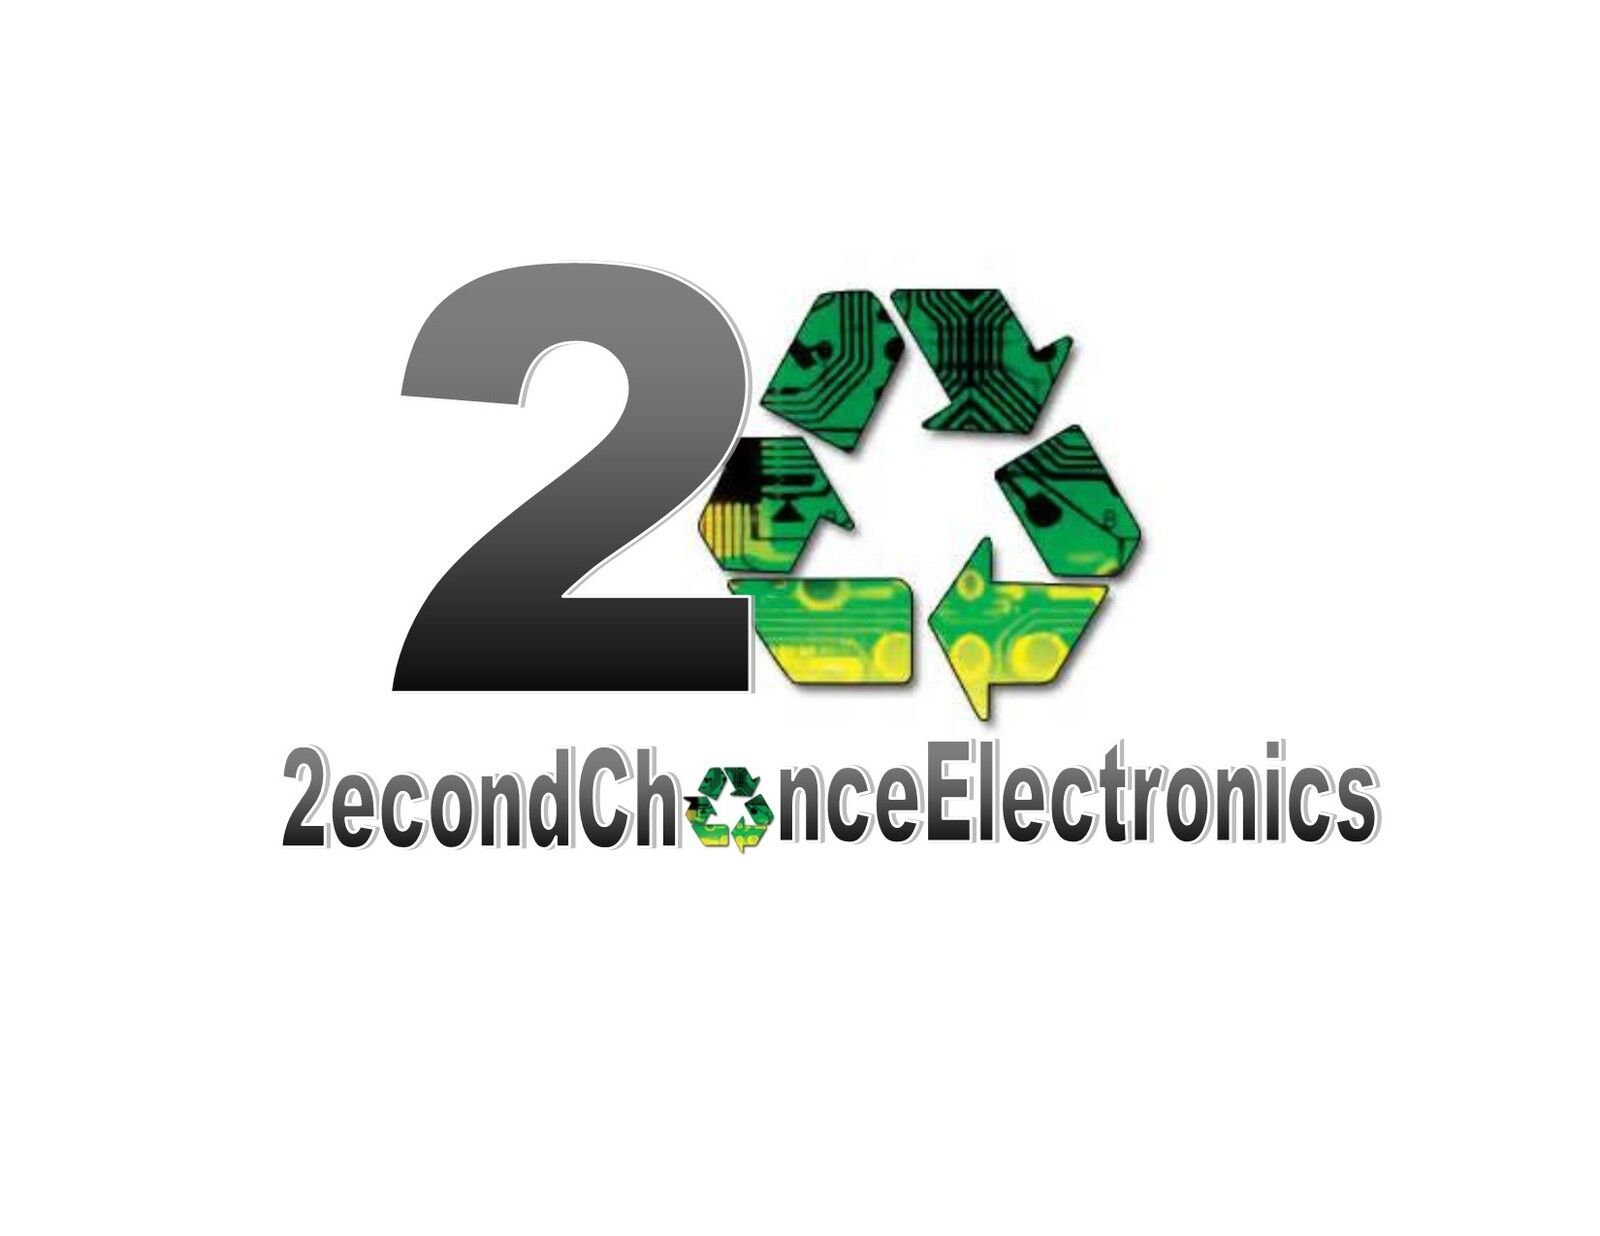 2econdChanceElectronics